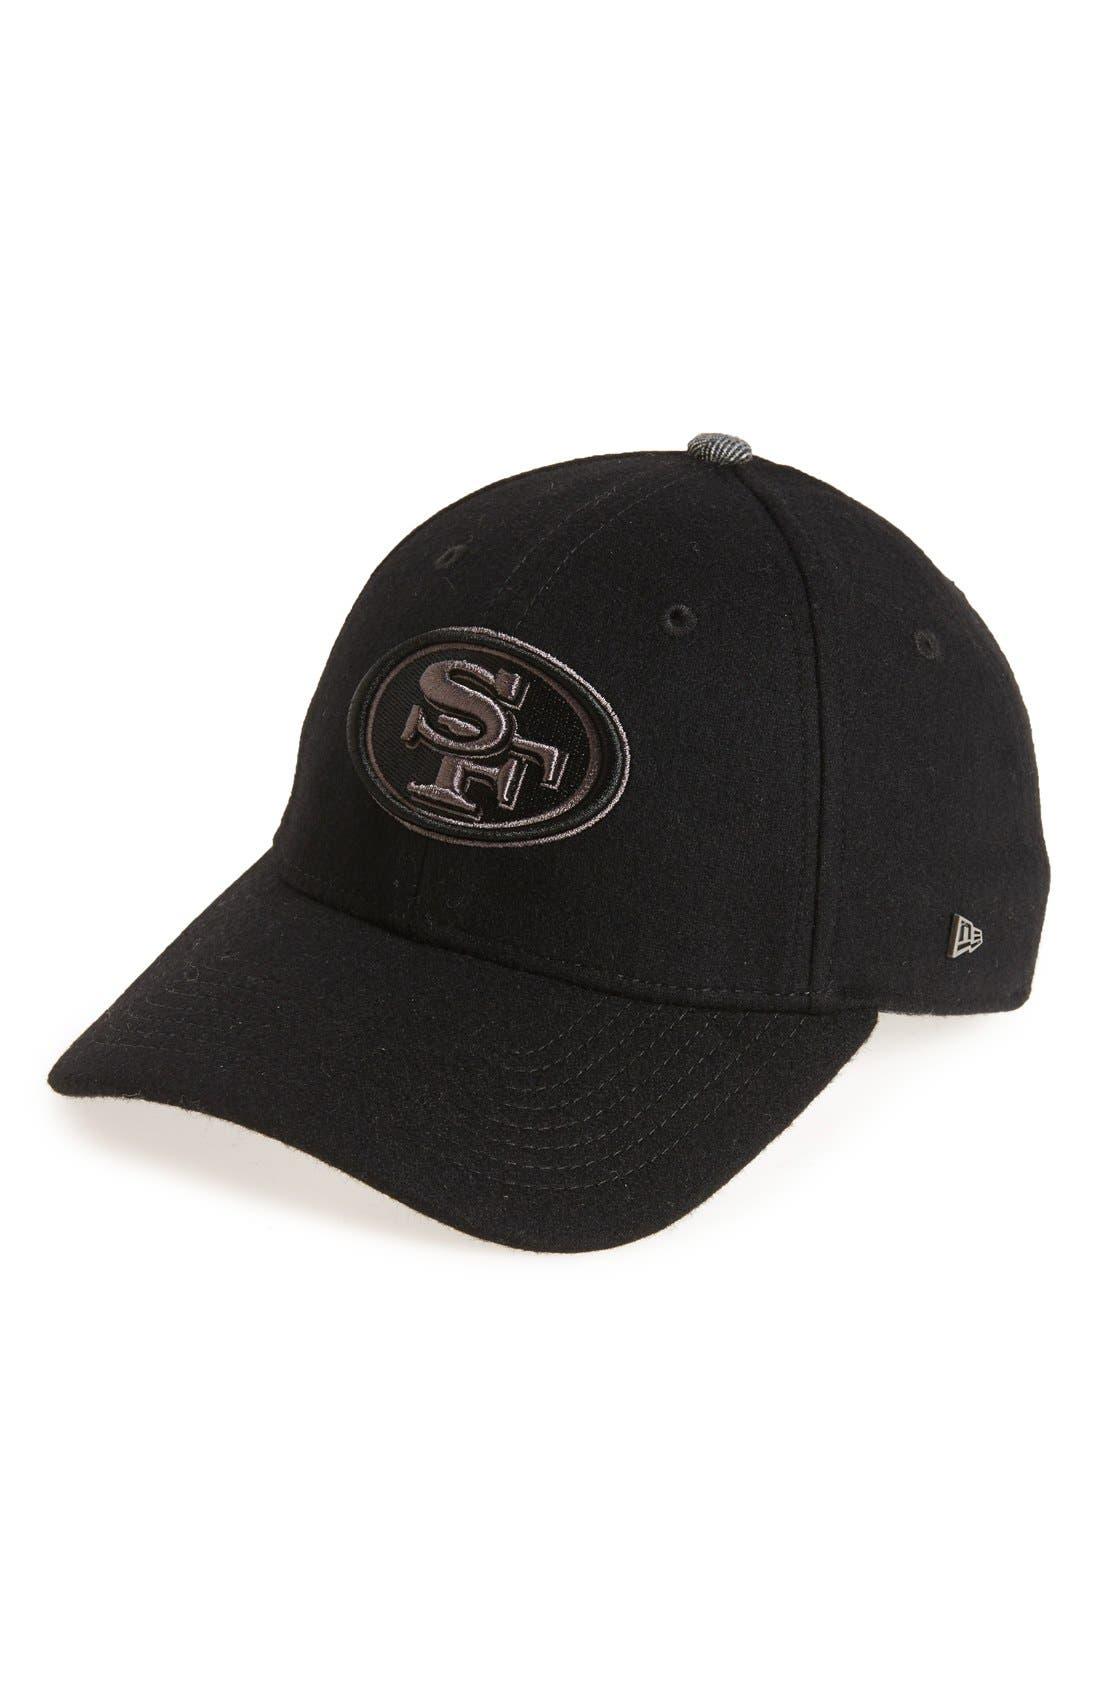 ff26588a10e63e ... canada 49forty san francisco 49ers baseball cap 7e010 1f69b